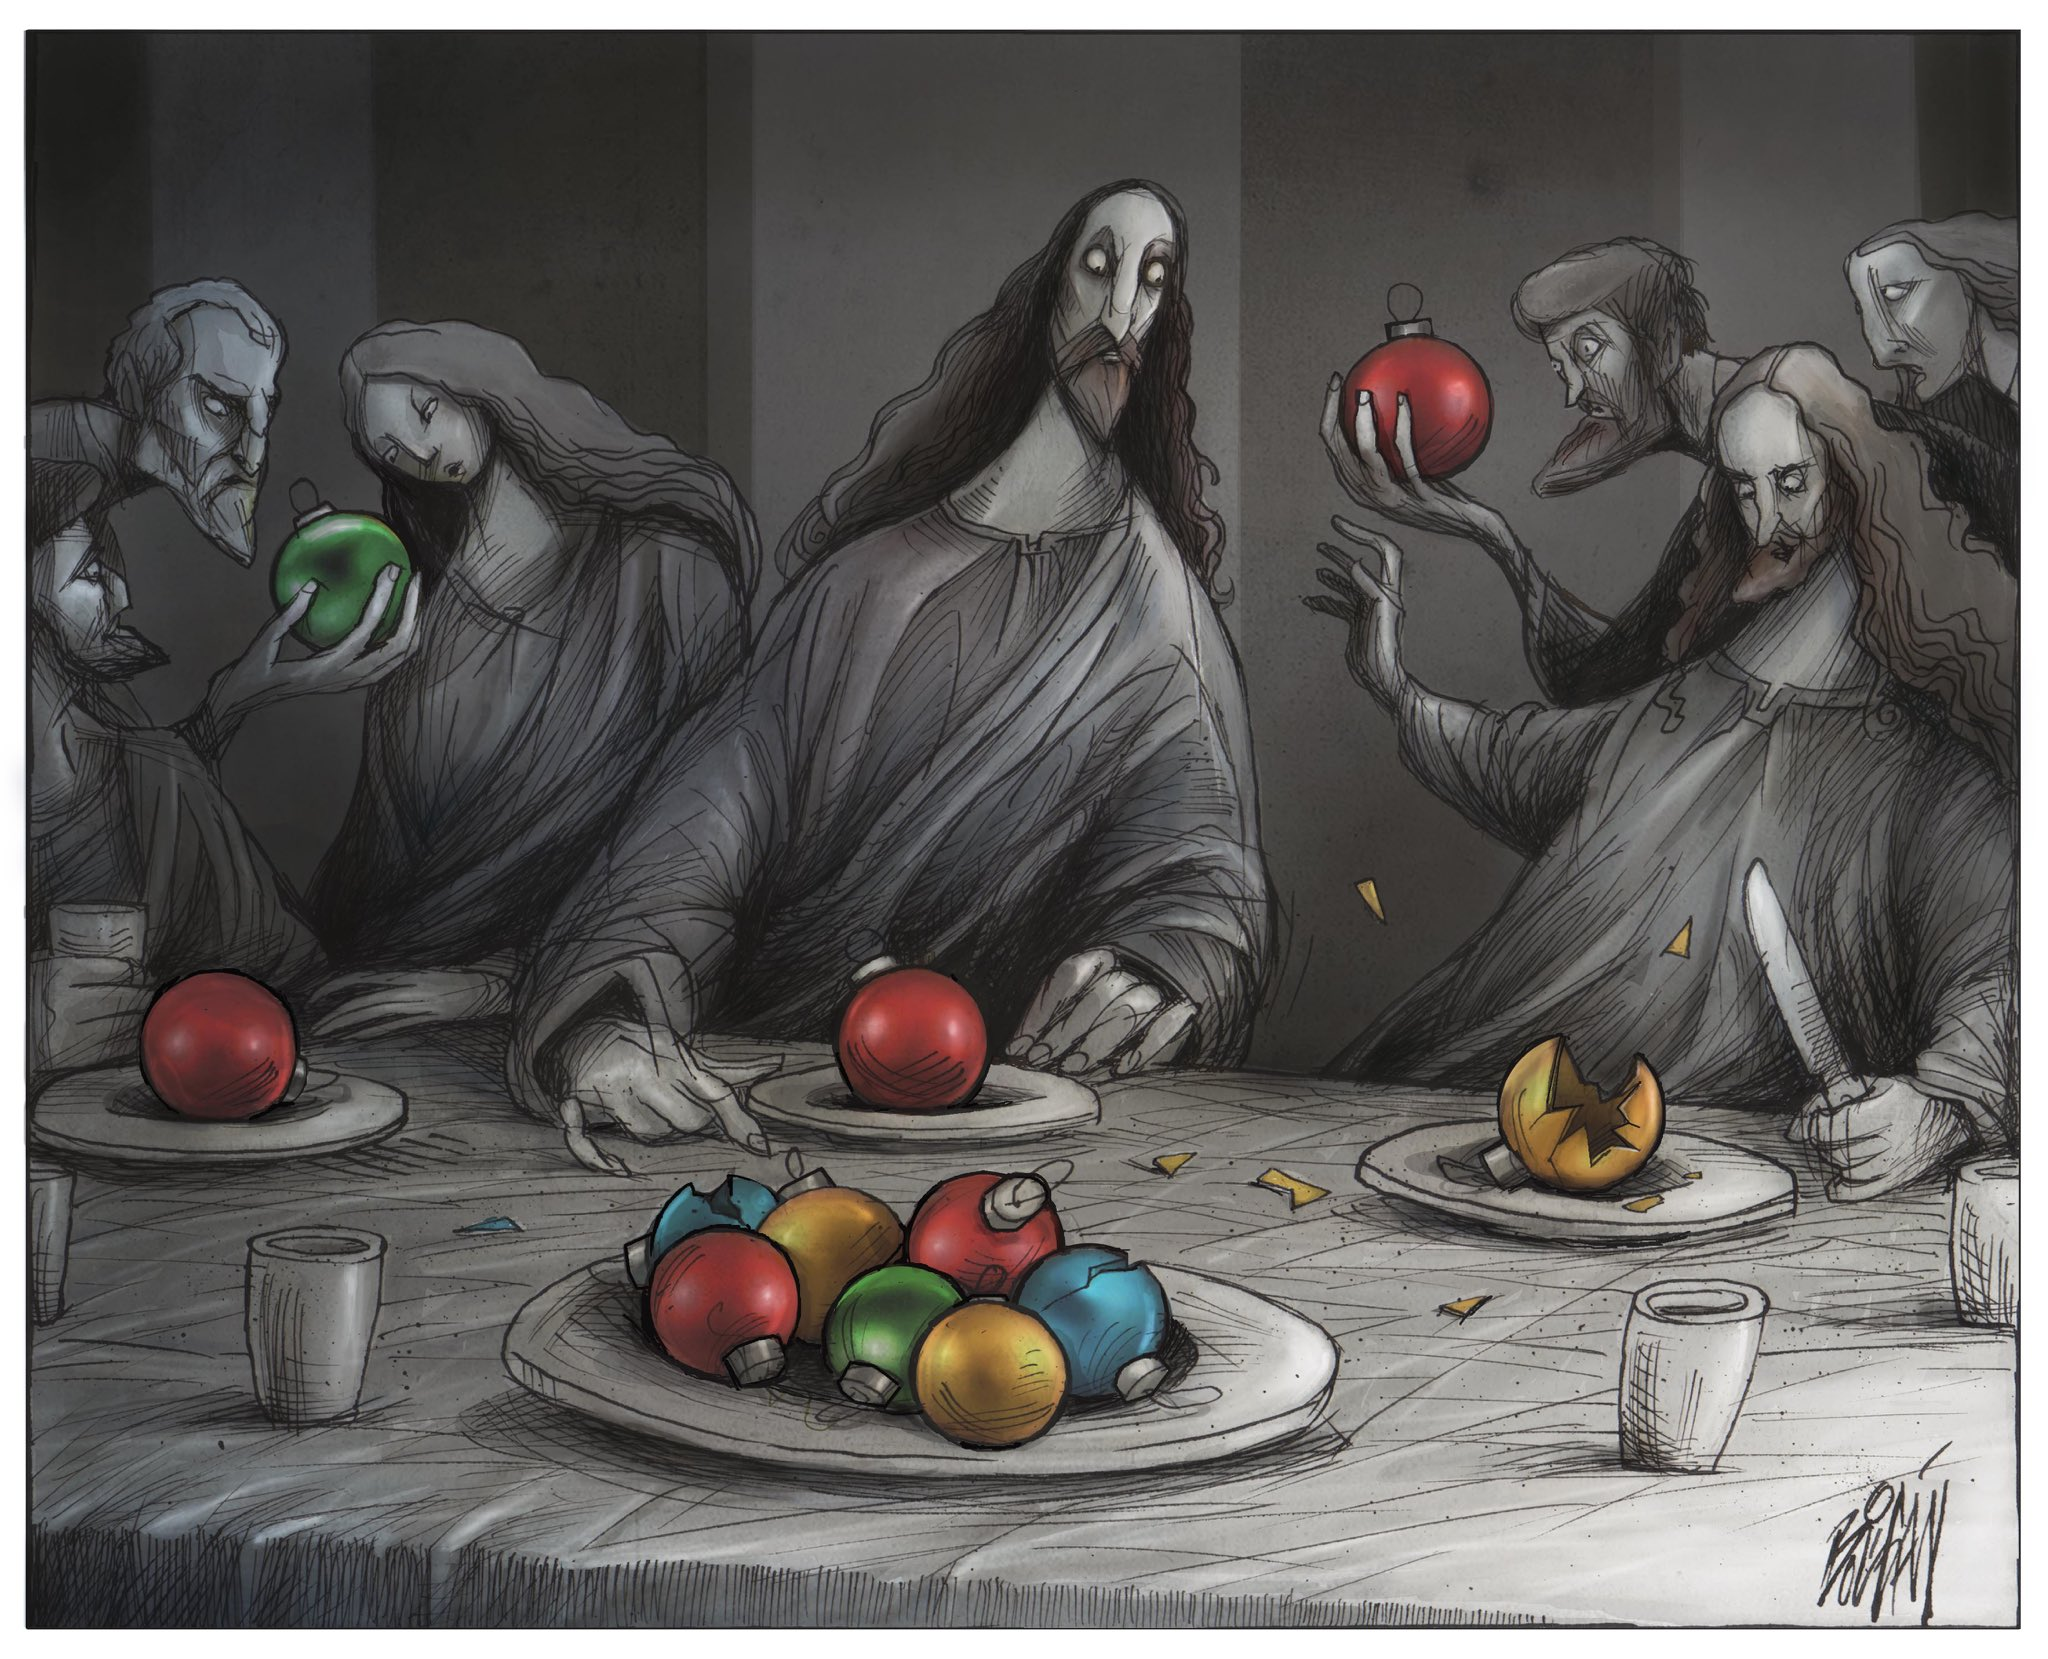 Angel Boligan – LA ÚLTIMA CENA – Comic cartoon xmas illustration